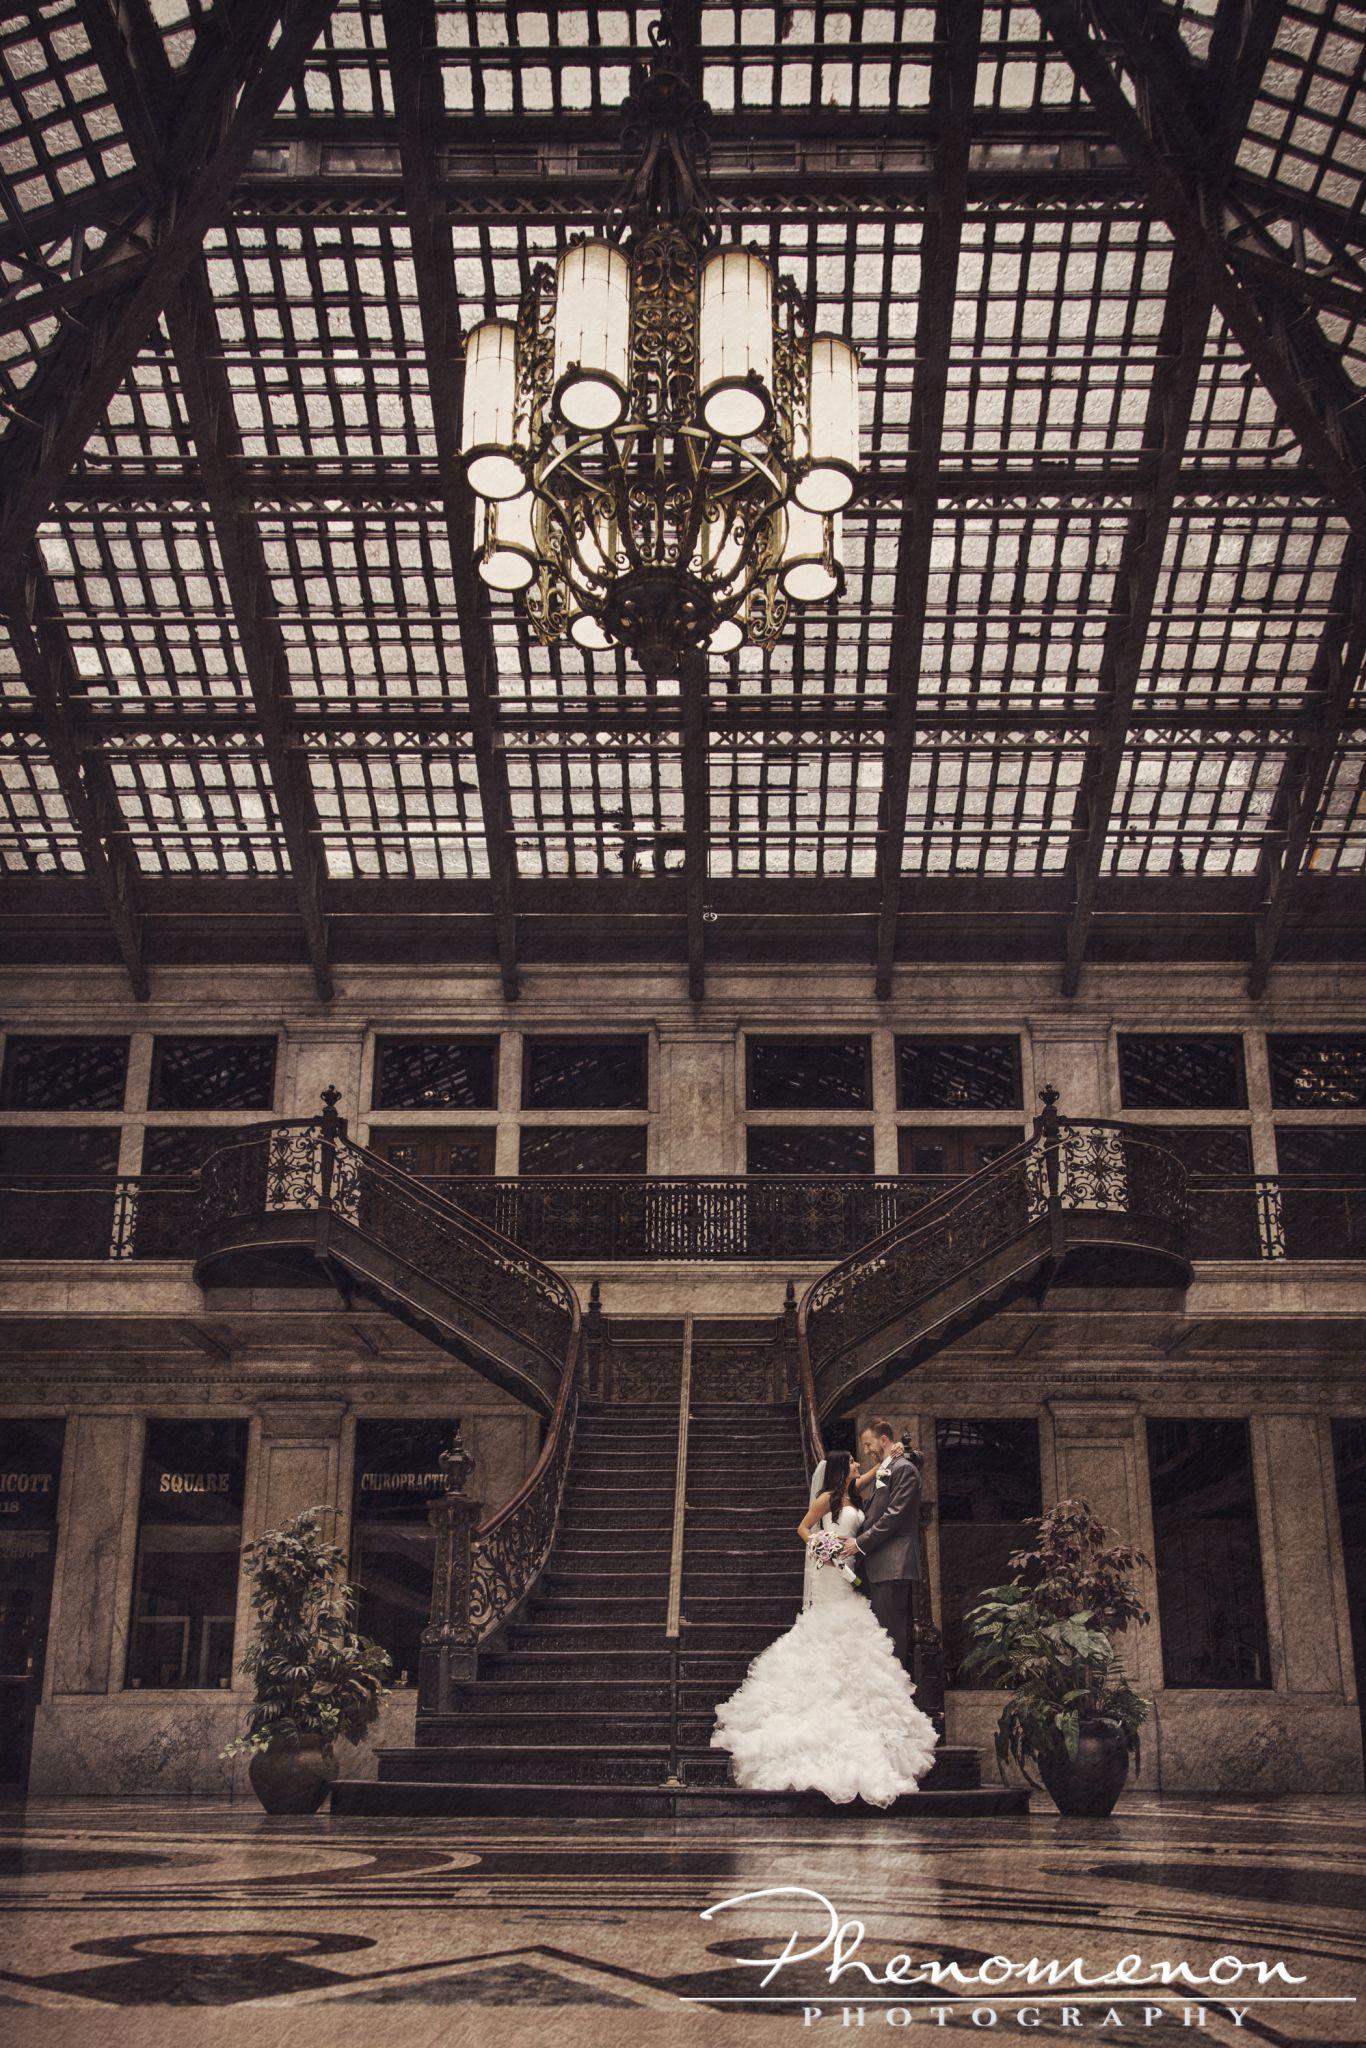 The phenomenon of wedding photography 43